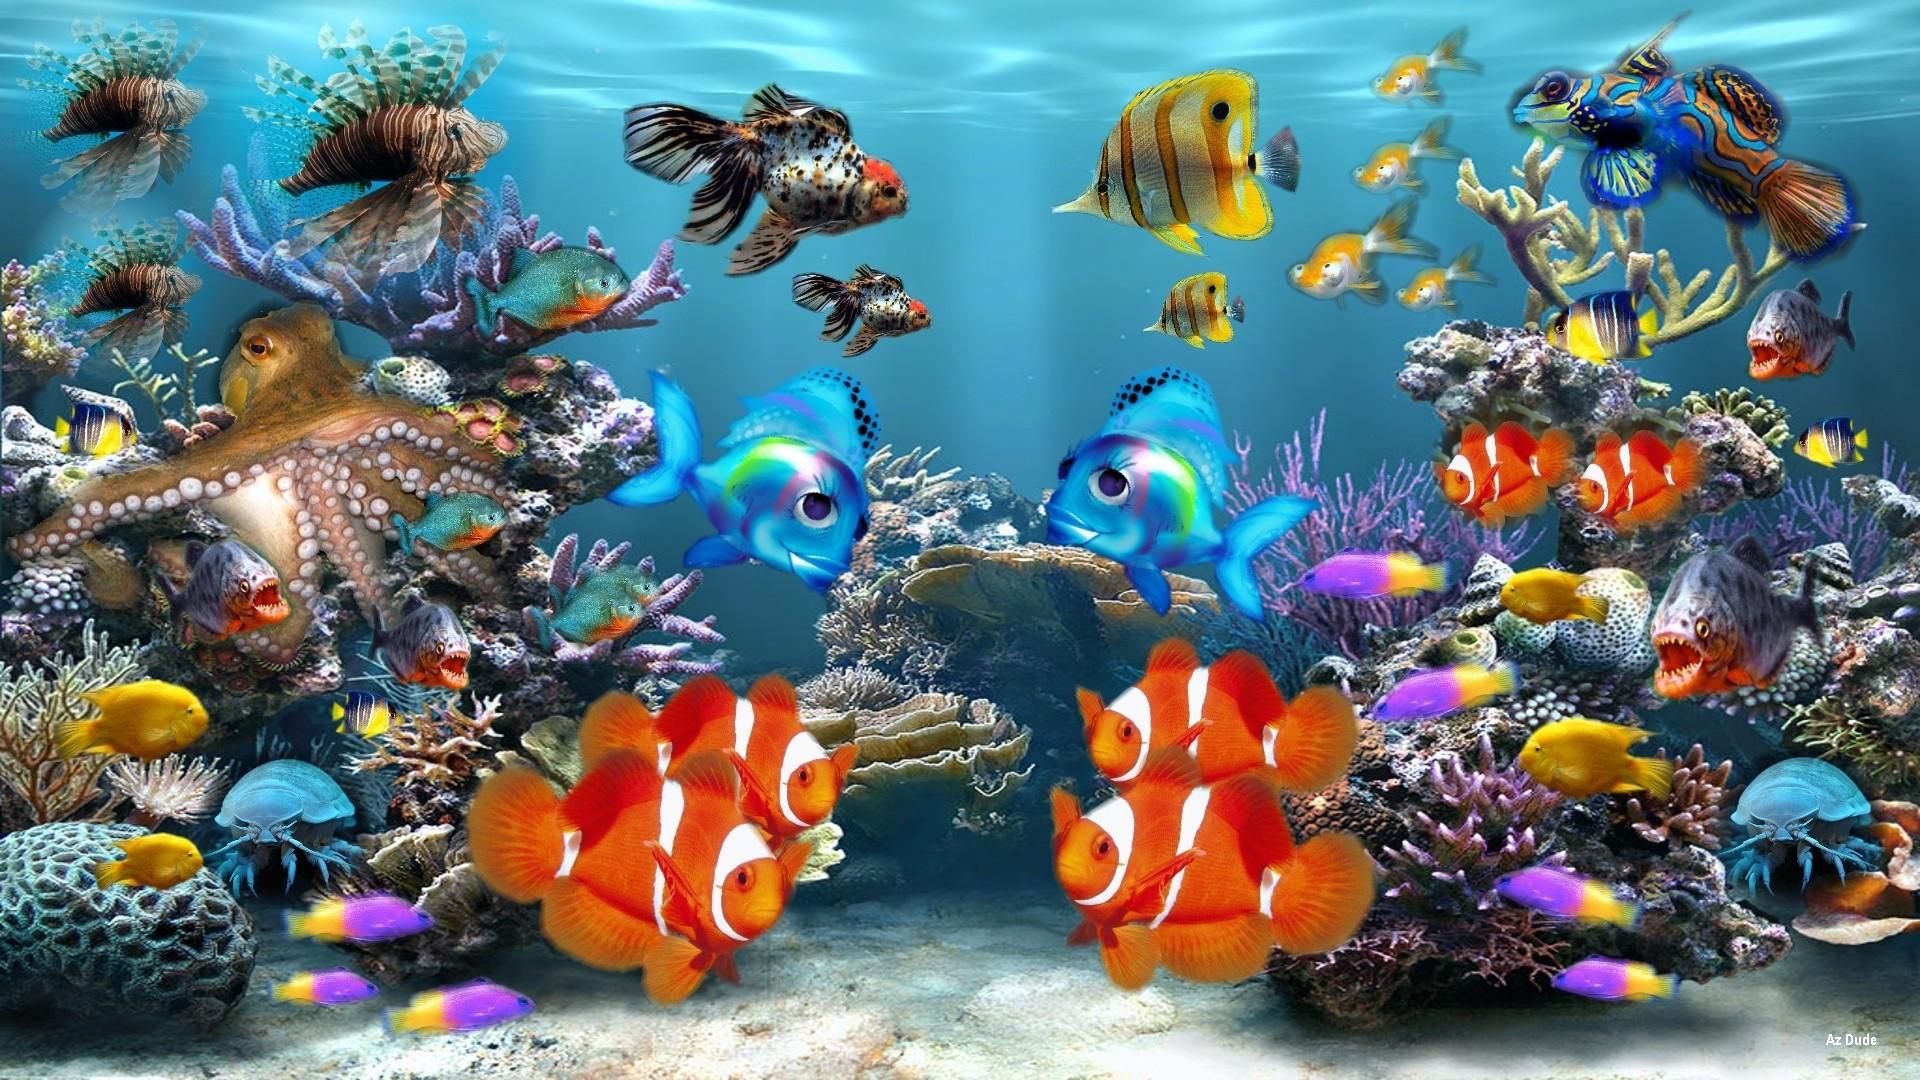 Fonds d'écran Aquarium PC et Tablettes (iPad, etc…)